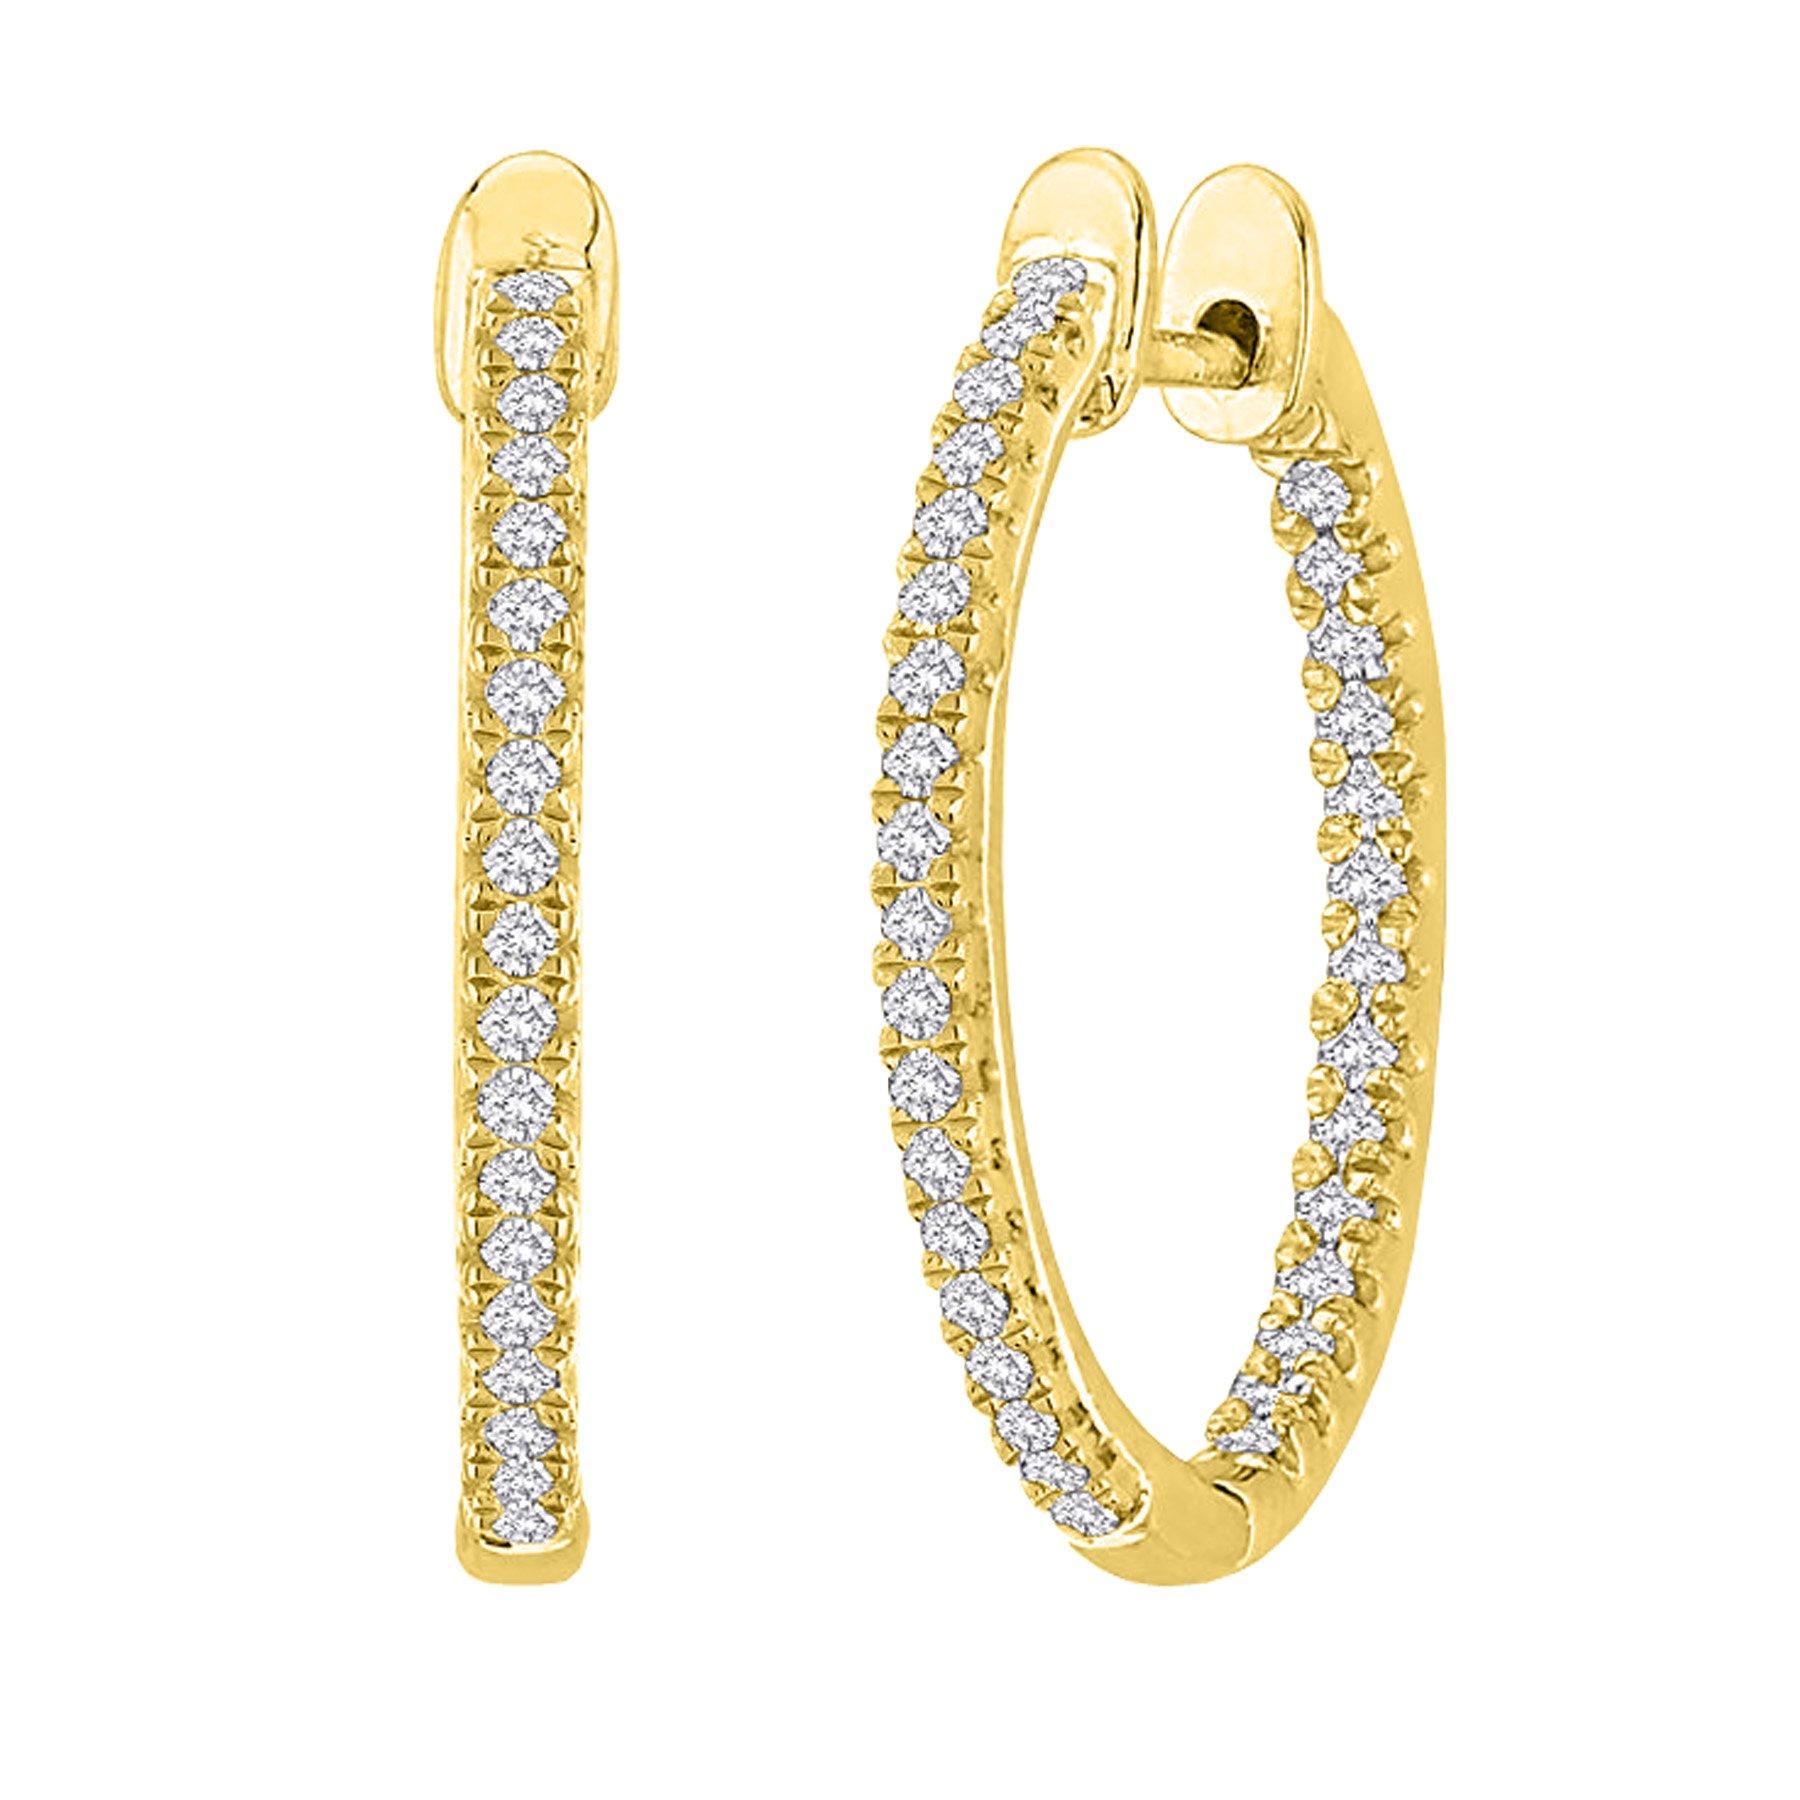 3 Carat t.w. Oval Inside Outside Diamond Hoop Earrings Premium Collection 14K Yellow Gold